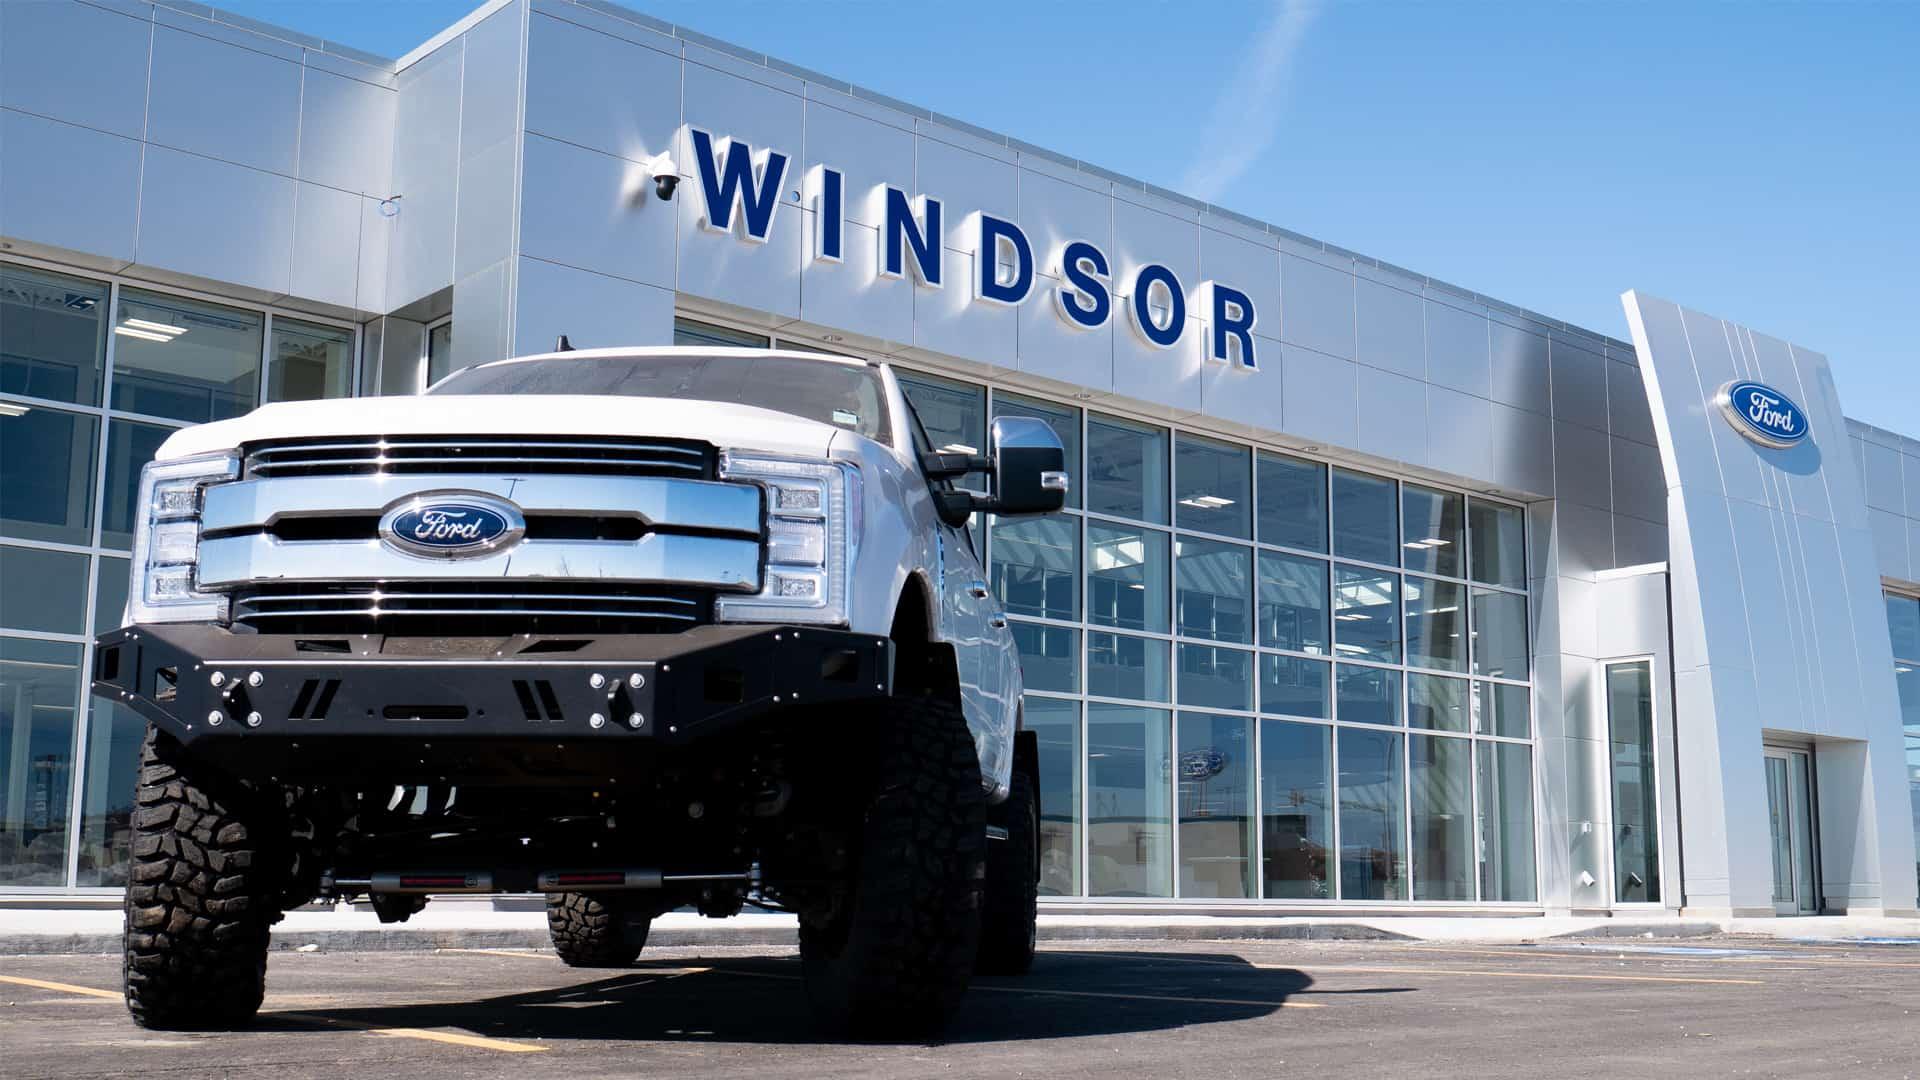 Canada's Biggest Ford Dealership